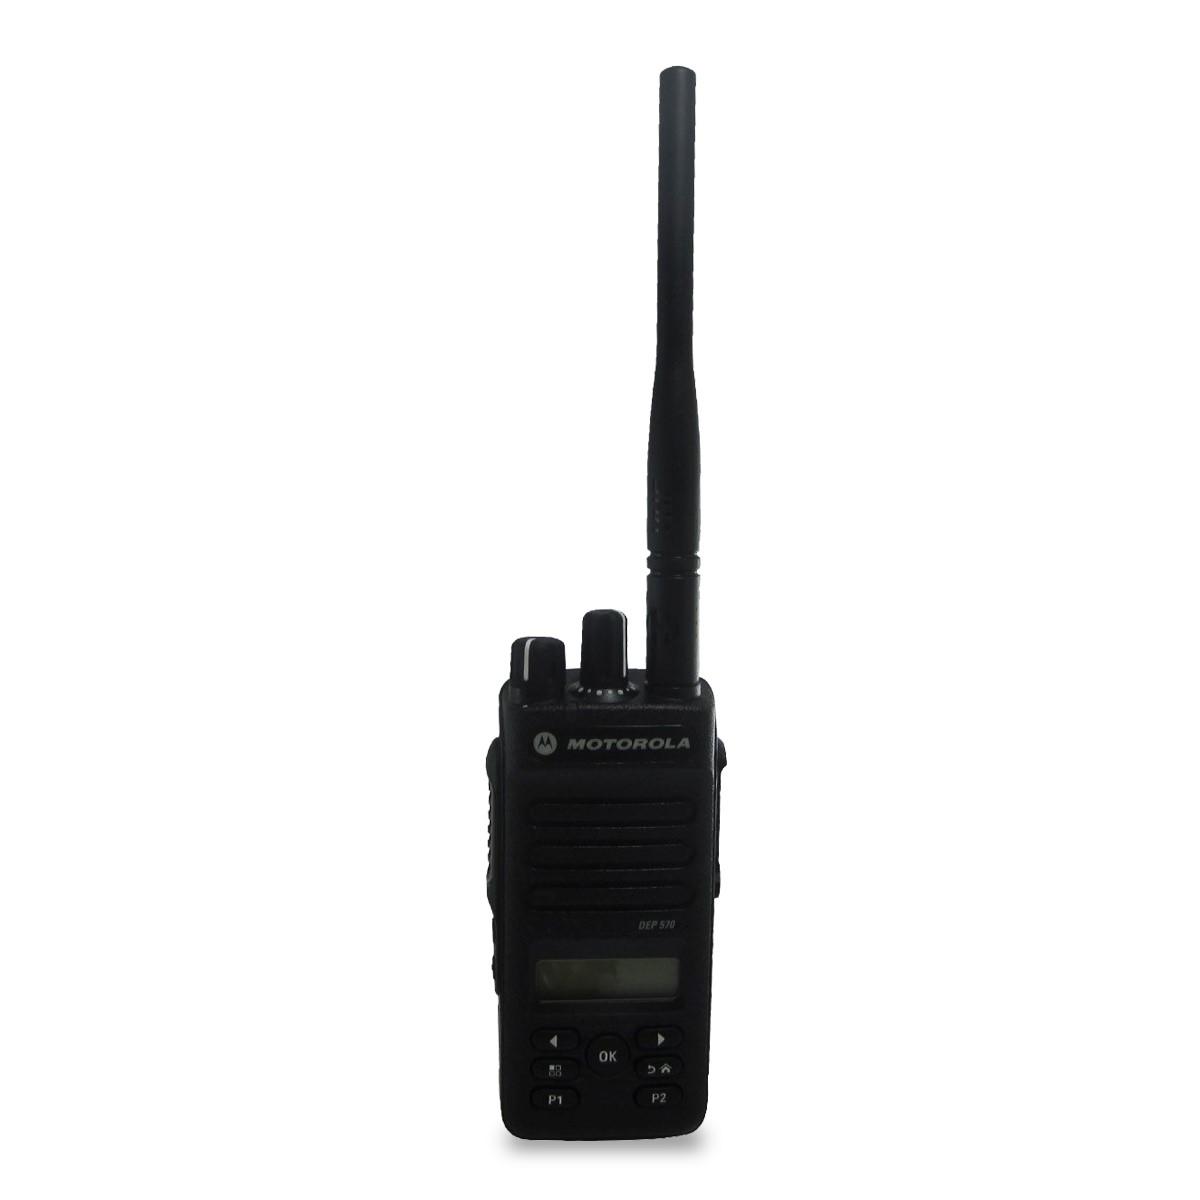 Radio Motorola DEP570 Digital LAH02JDH9JA2N VHF 136-174 MHz